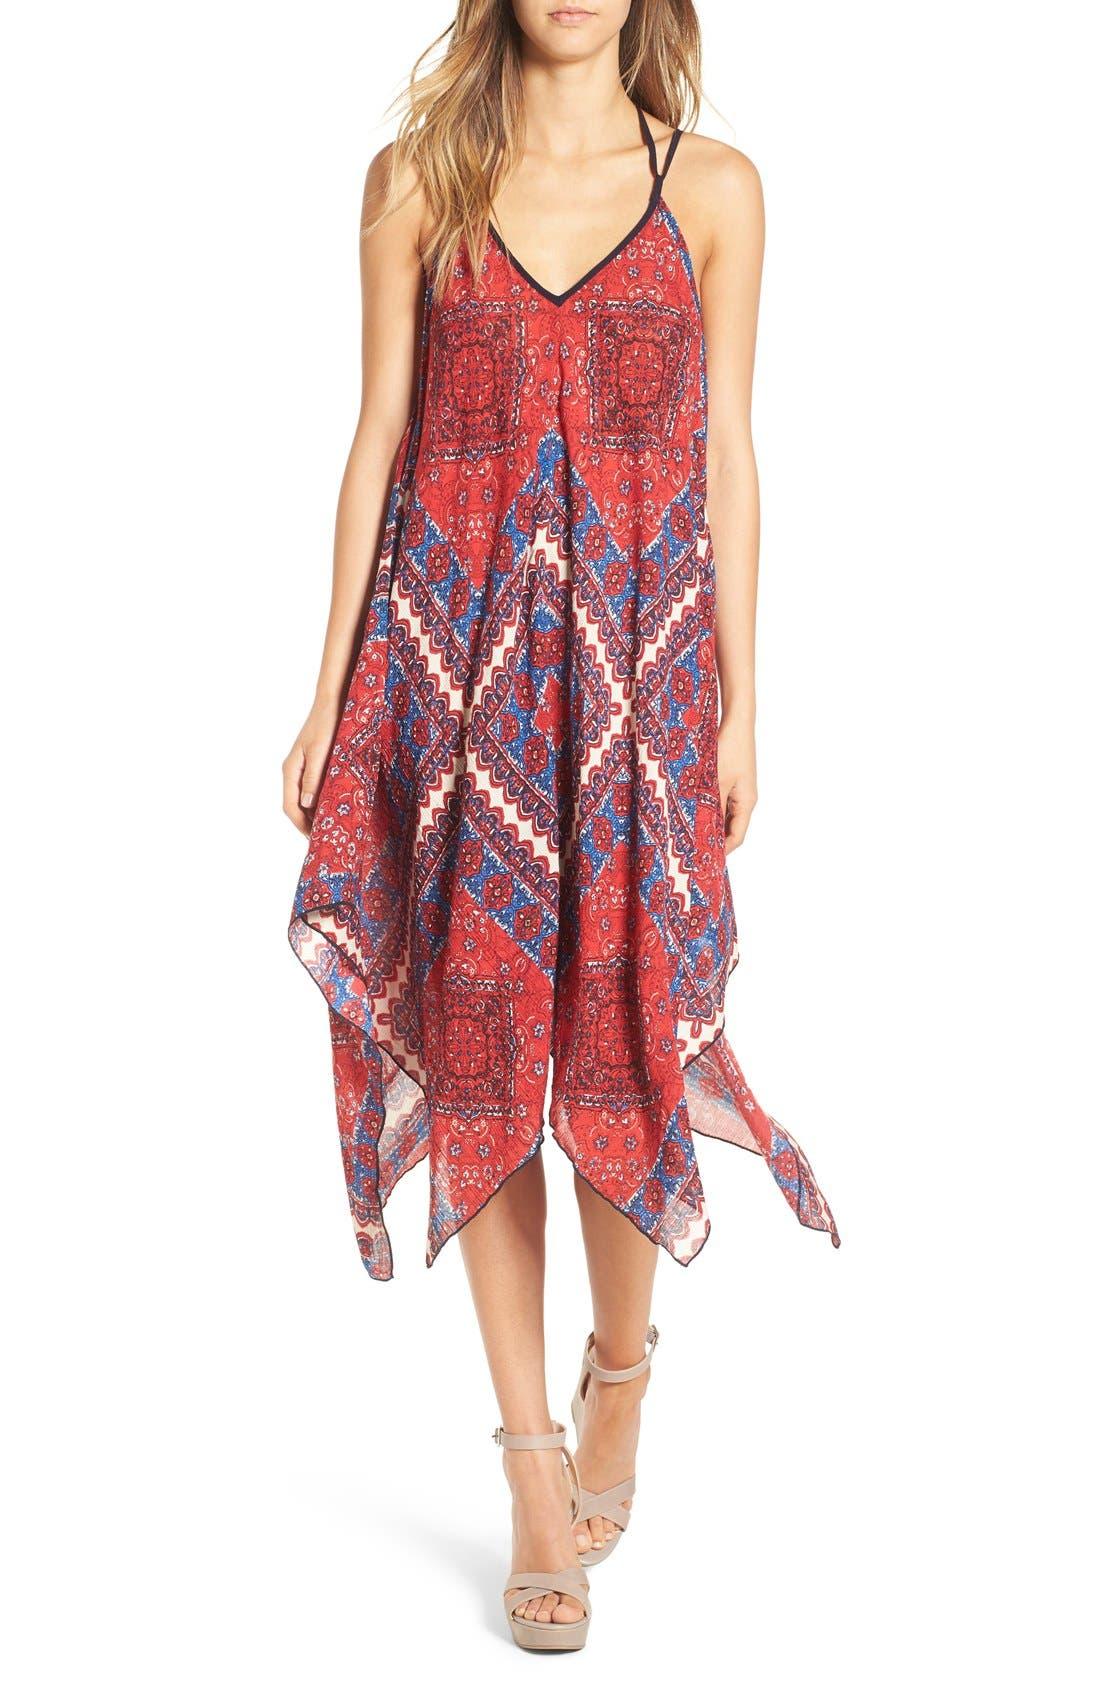 Alternate Image 1 Selected - Band of Gypsies Scarf Print Handkerchief Hem Dress